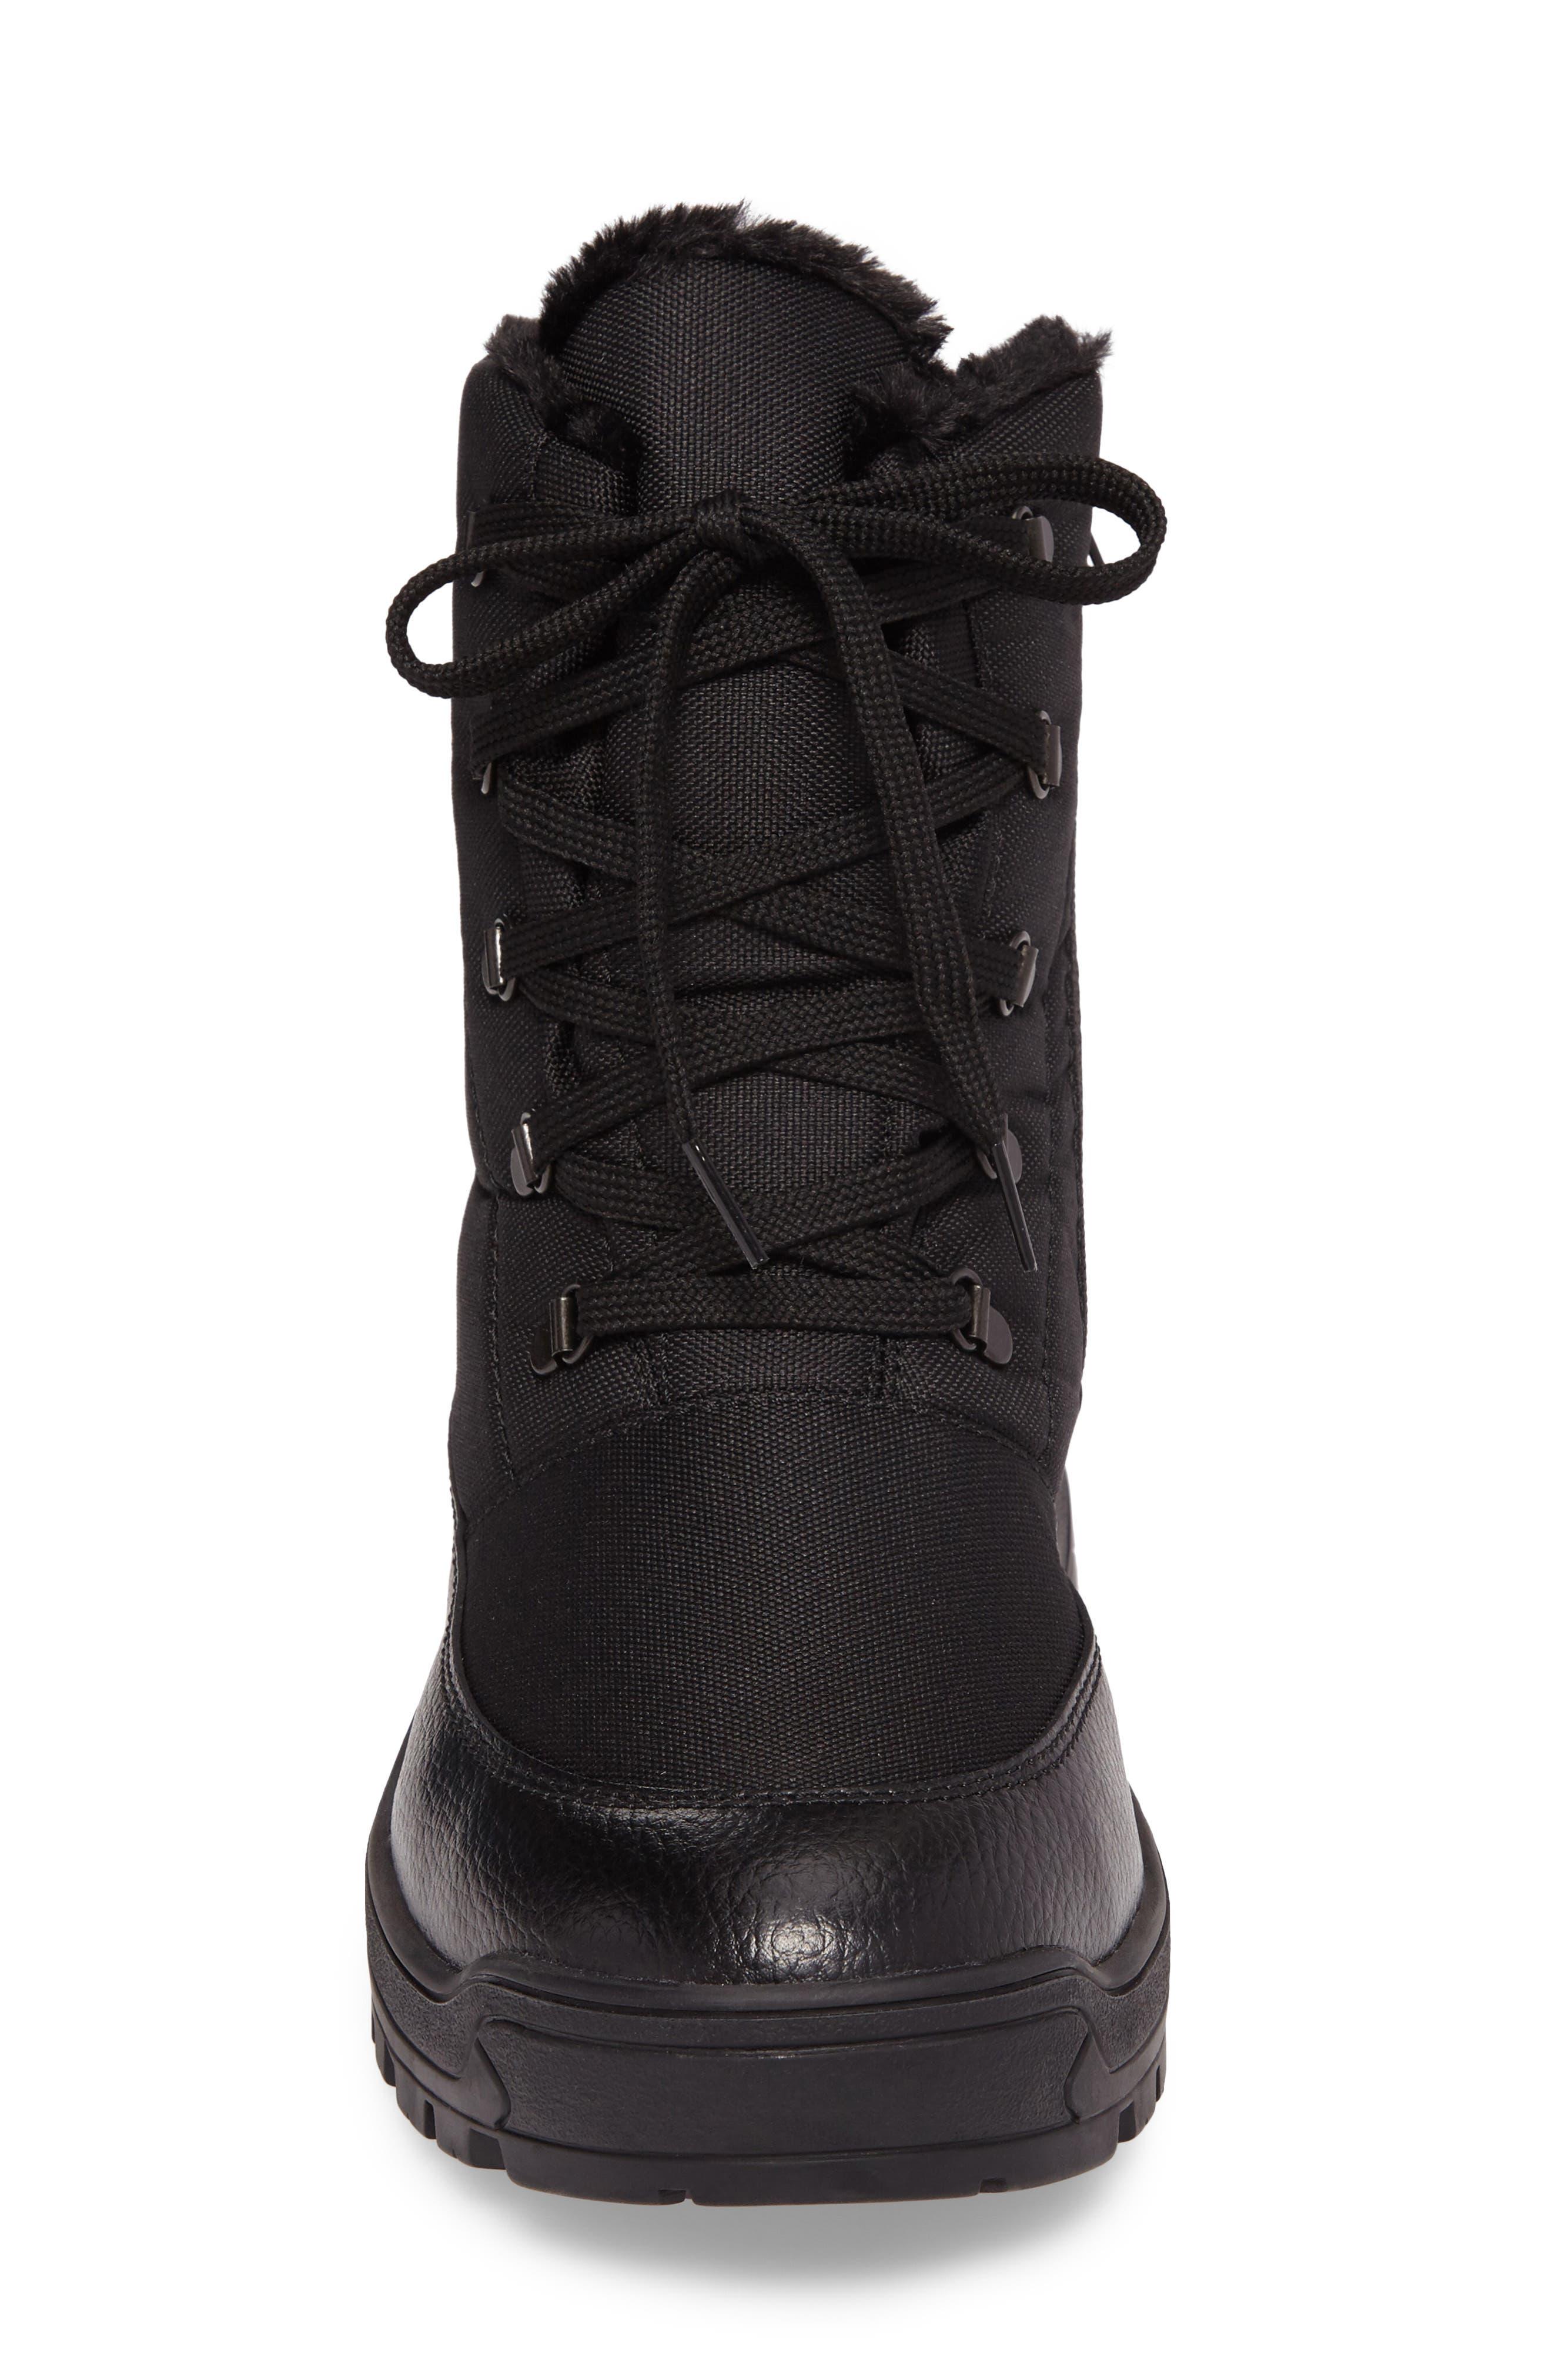 Trigger Winter Waterproof Boot,                             Alternate thumbnail 4, color,                             BLACK